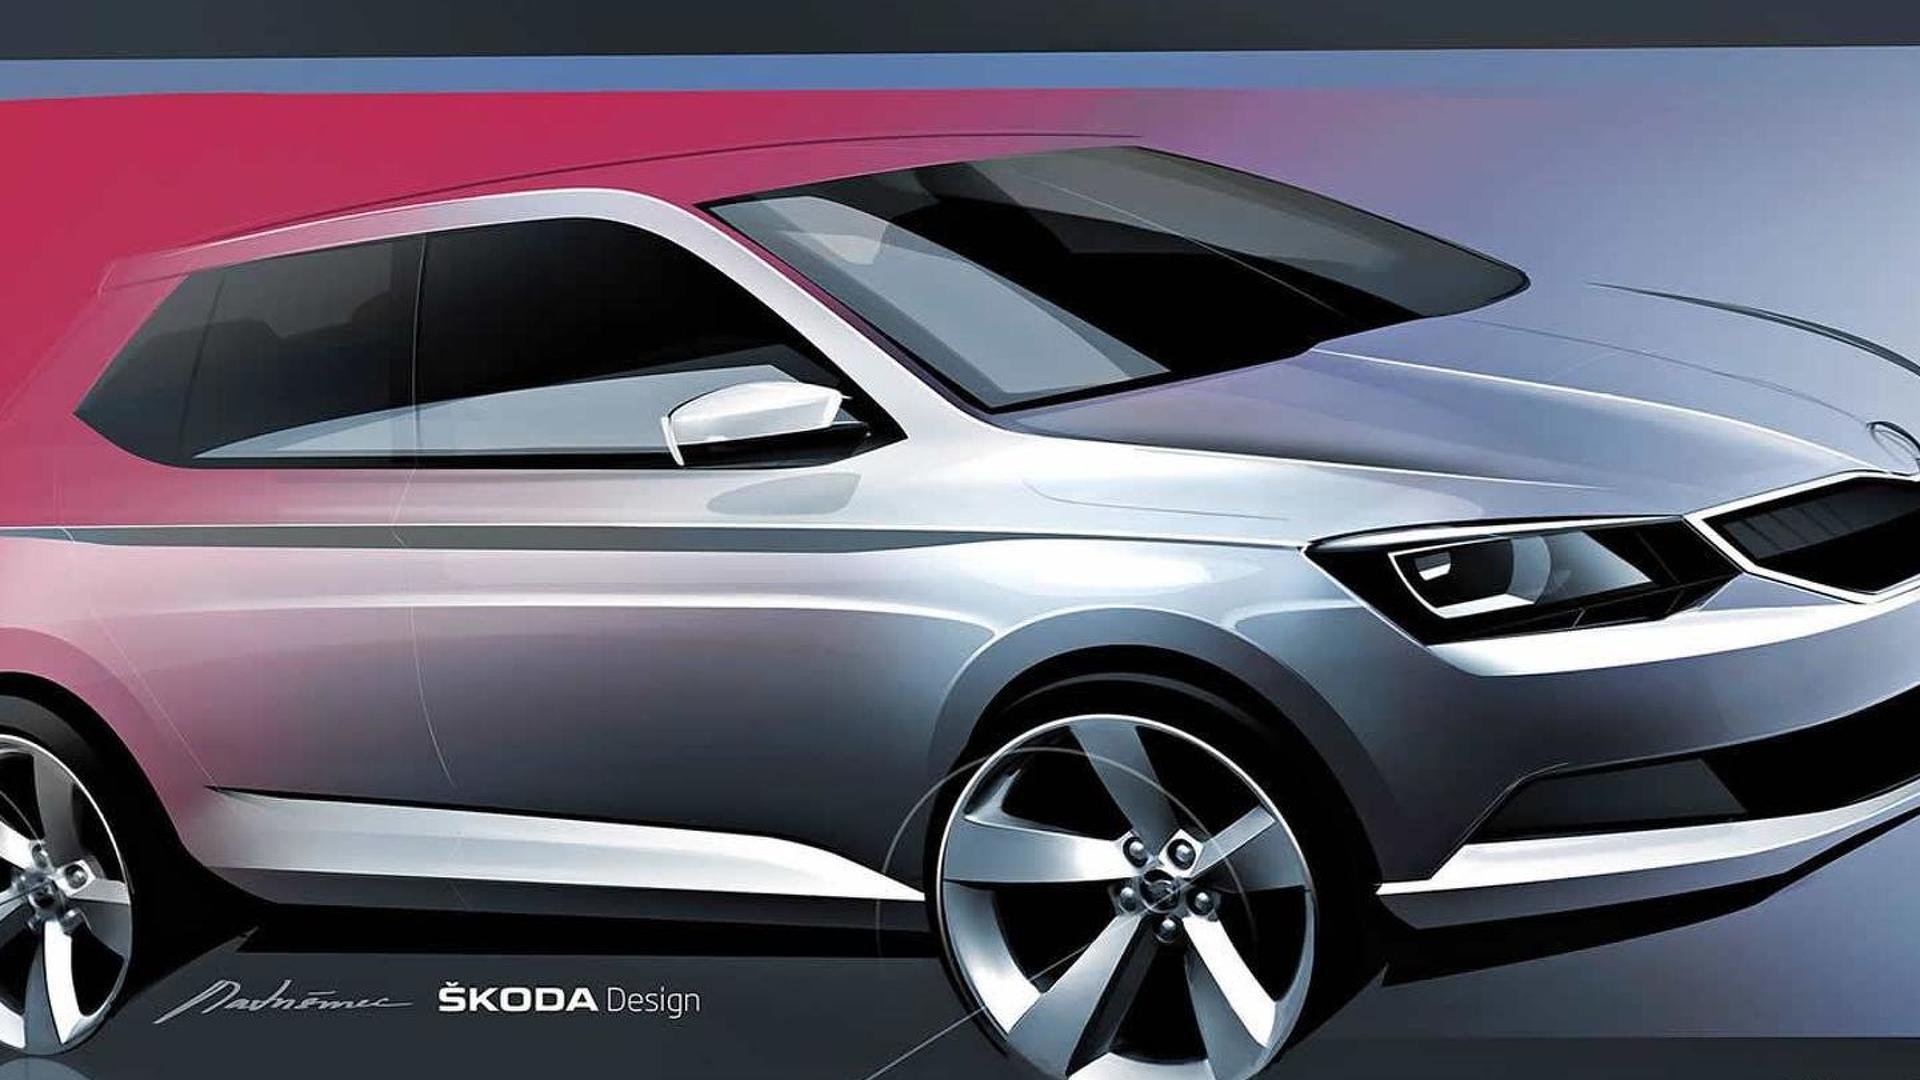 2015 Skoda Fabia engine lineup revealed, all units meet Euro 6 standard